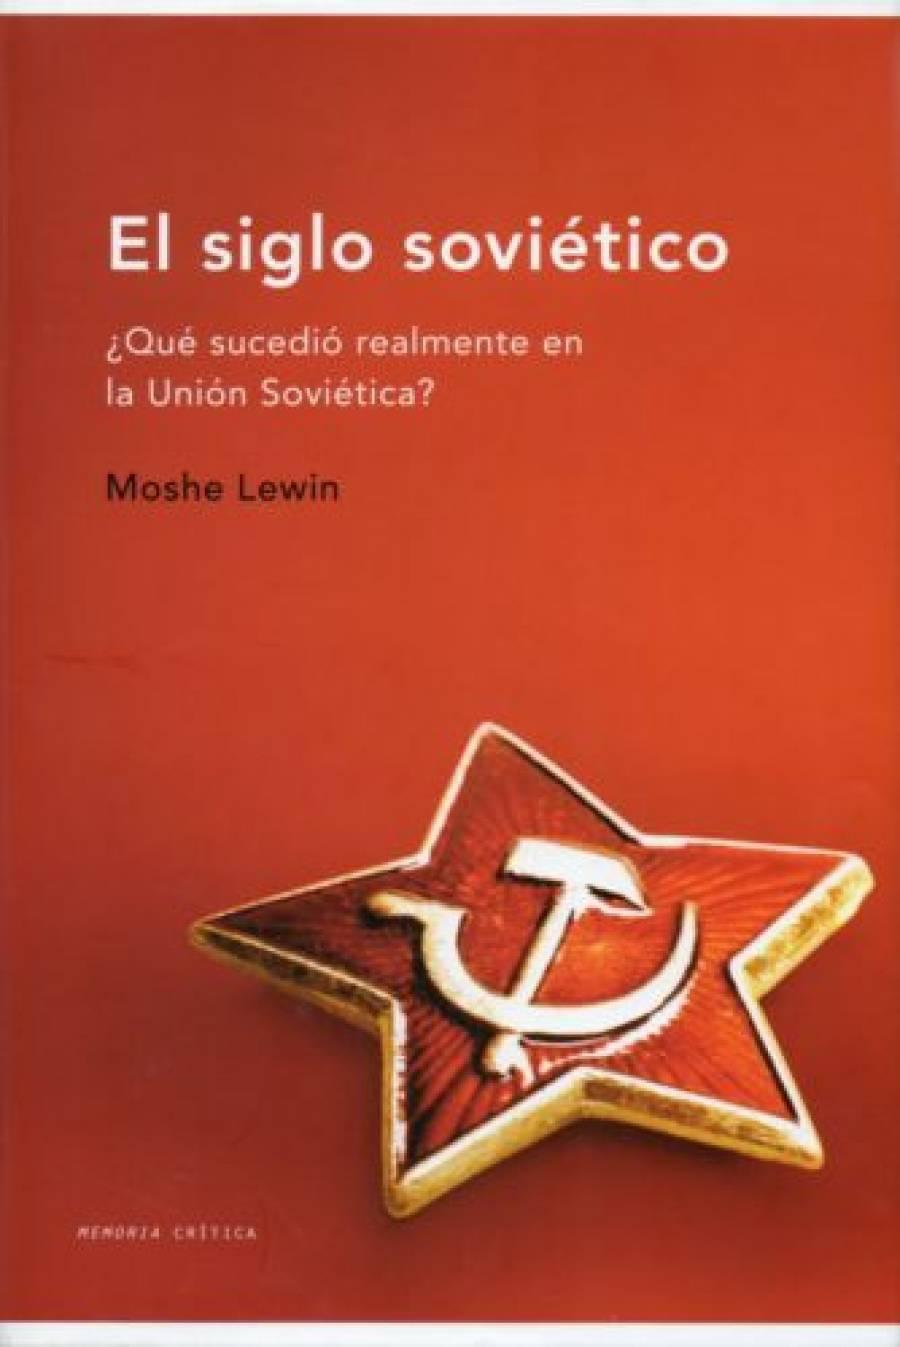 El siglo sovietico (EPUB) -Moshe Lewin